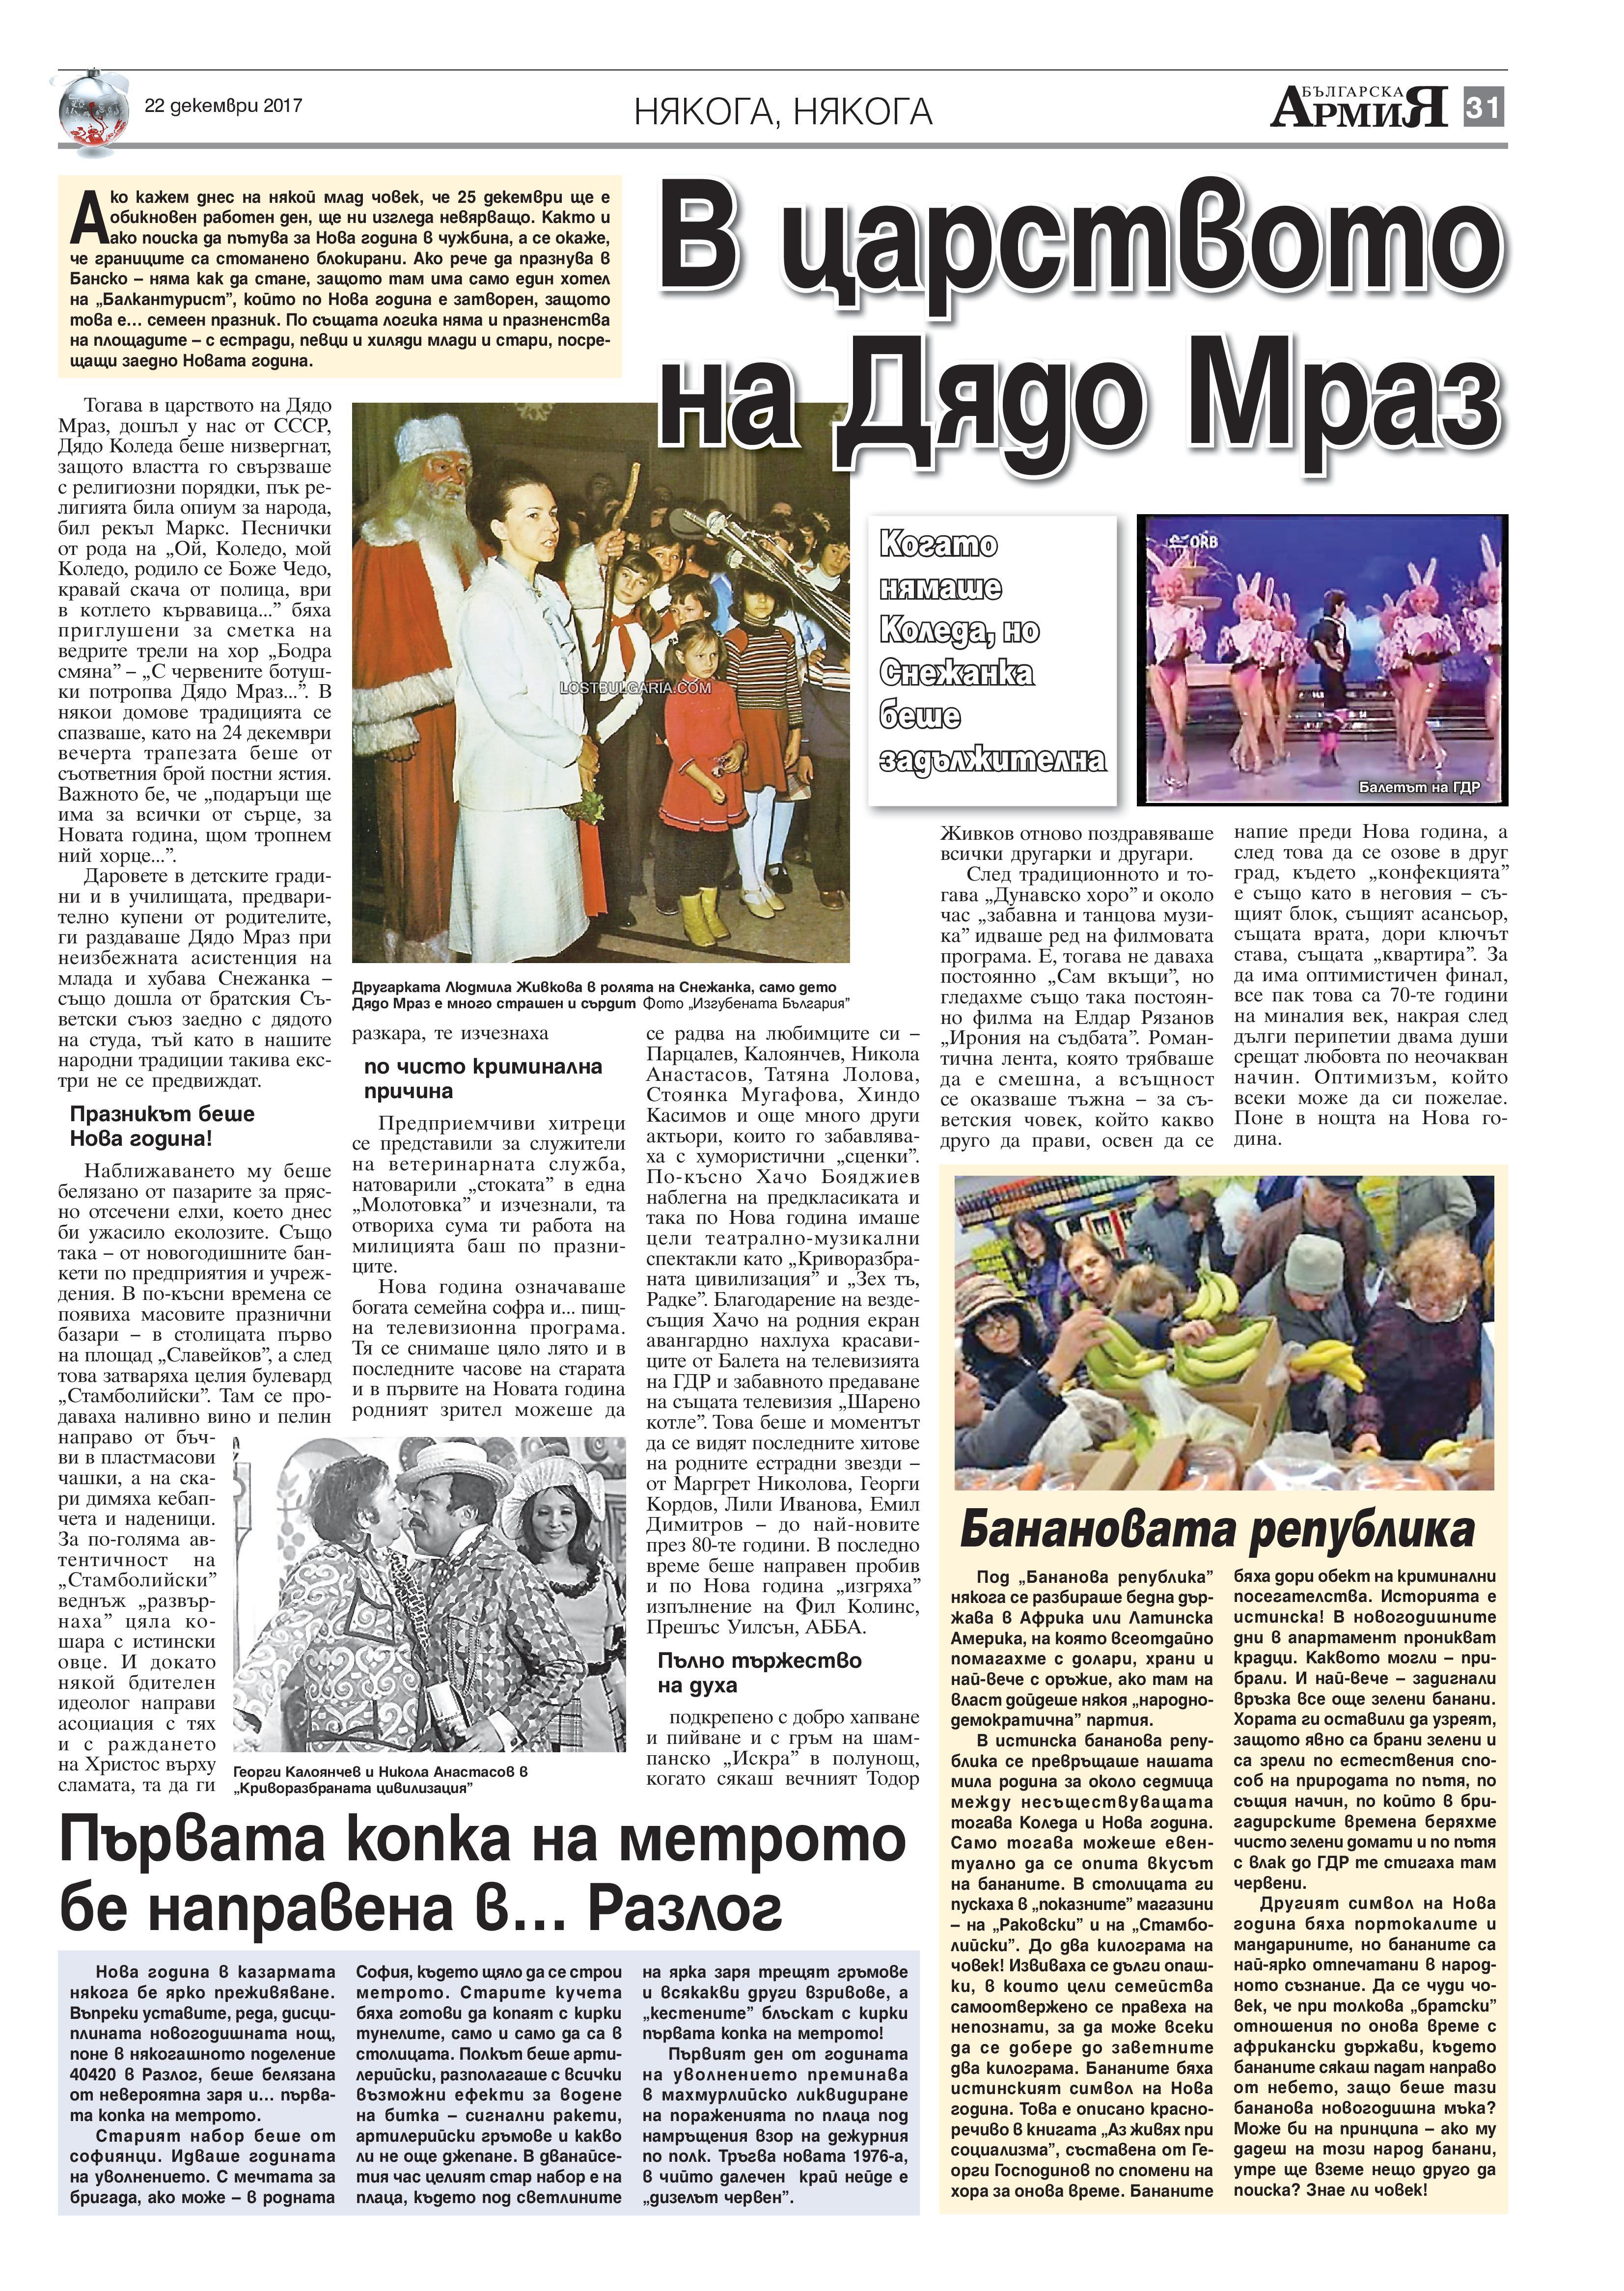 http://armymedia.bg/wp-content/uploads/2015/06/31-16.jpg